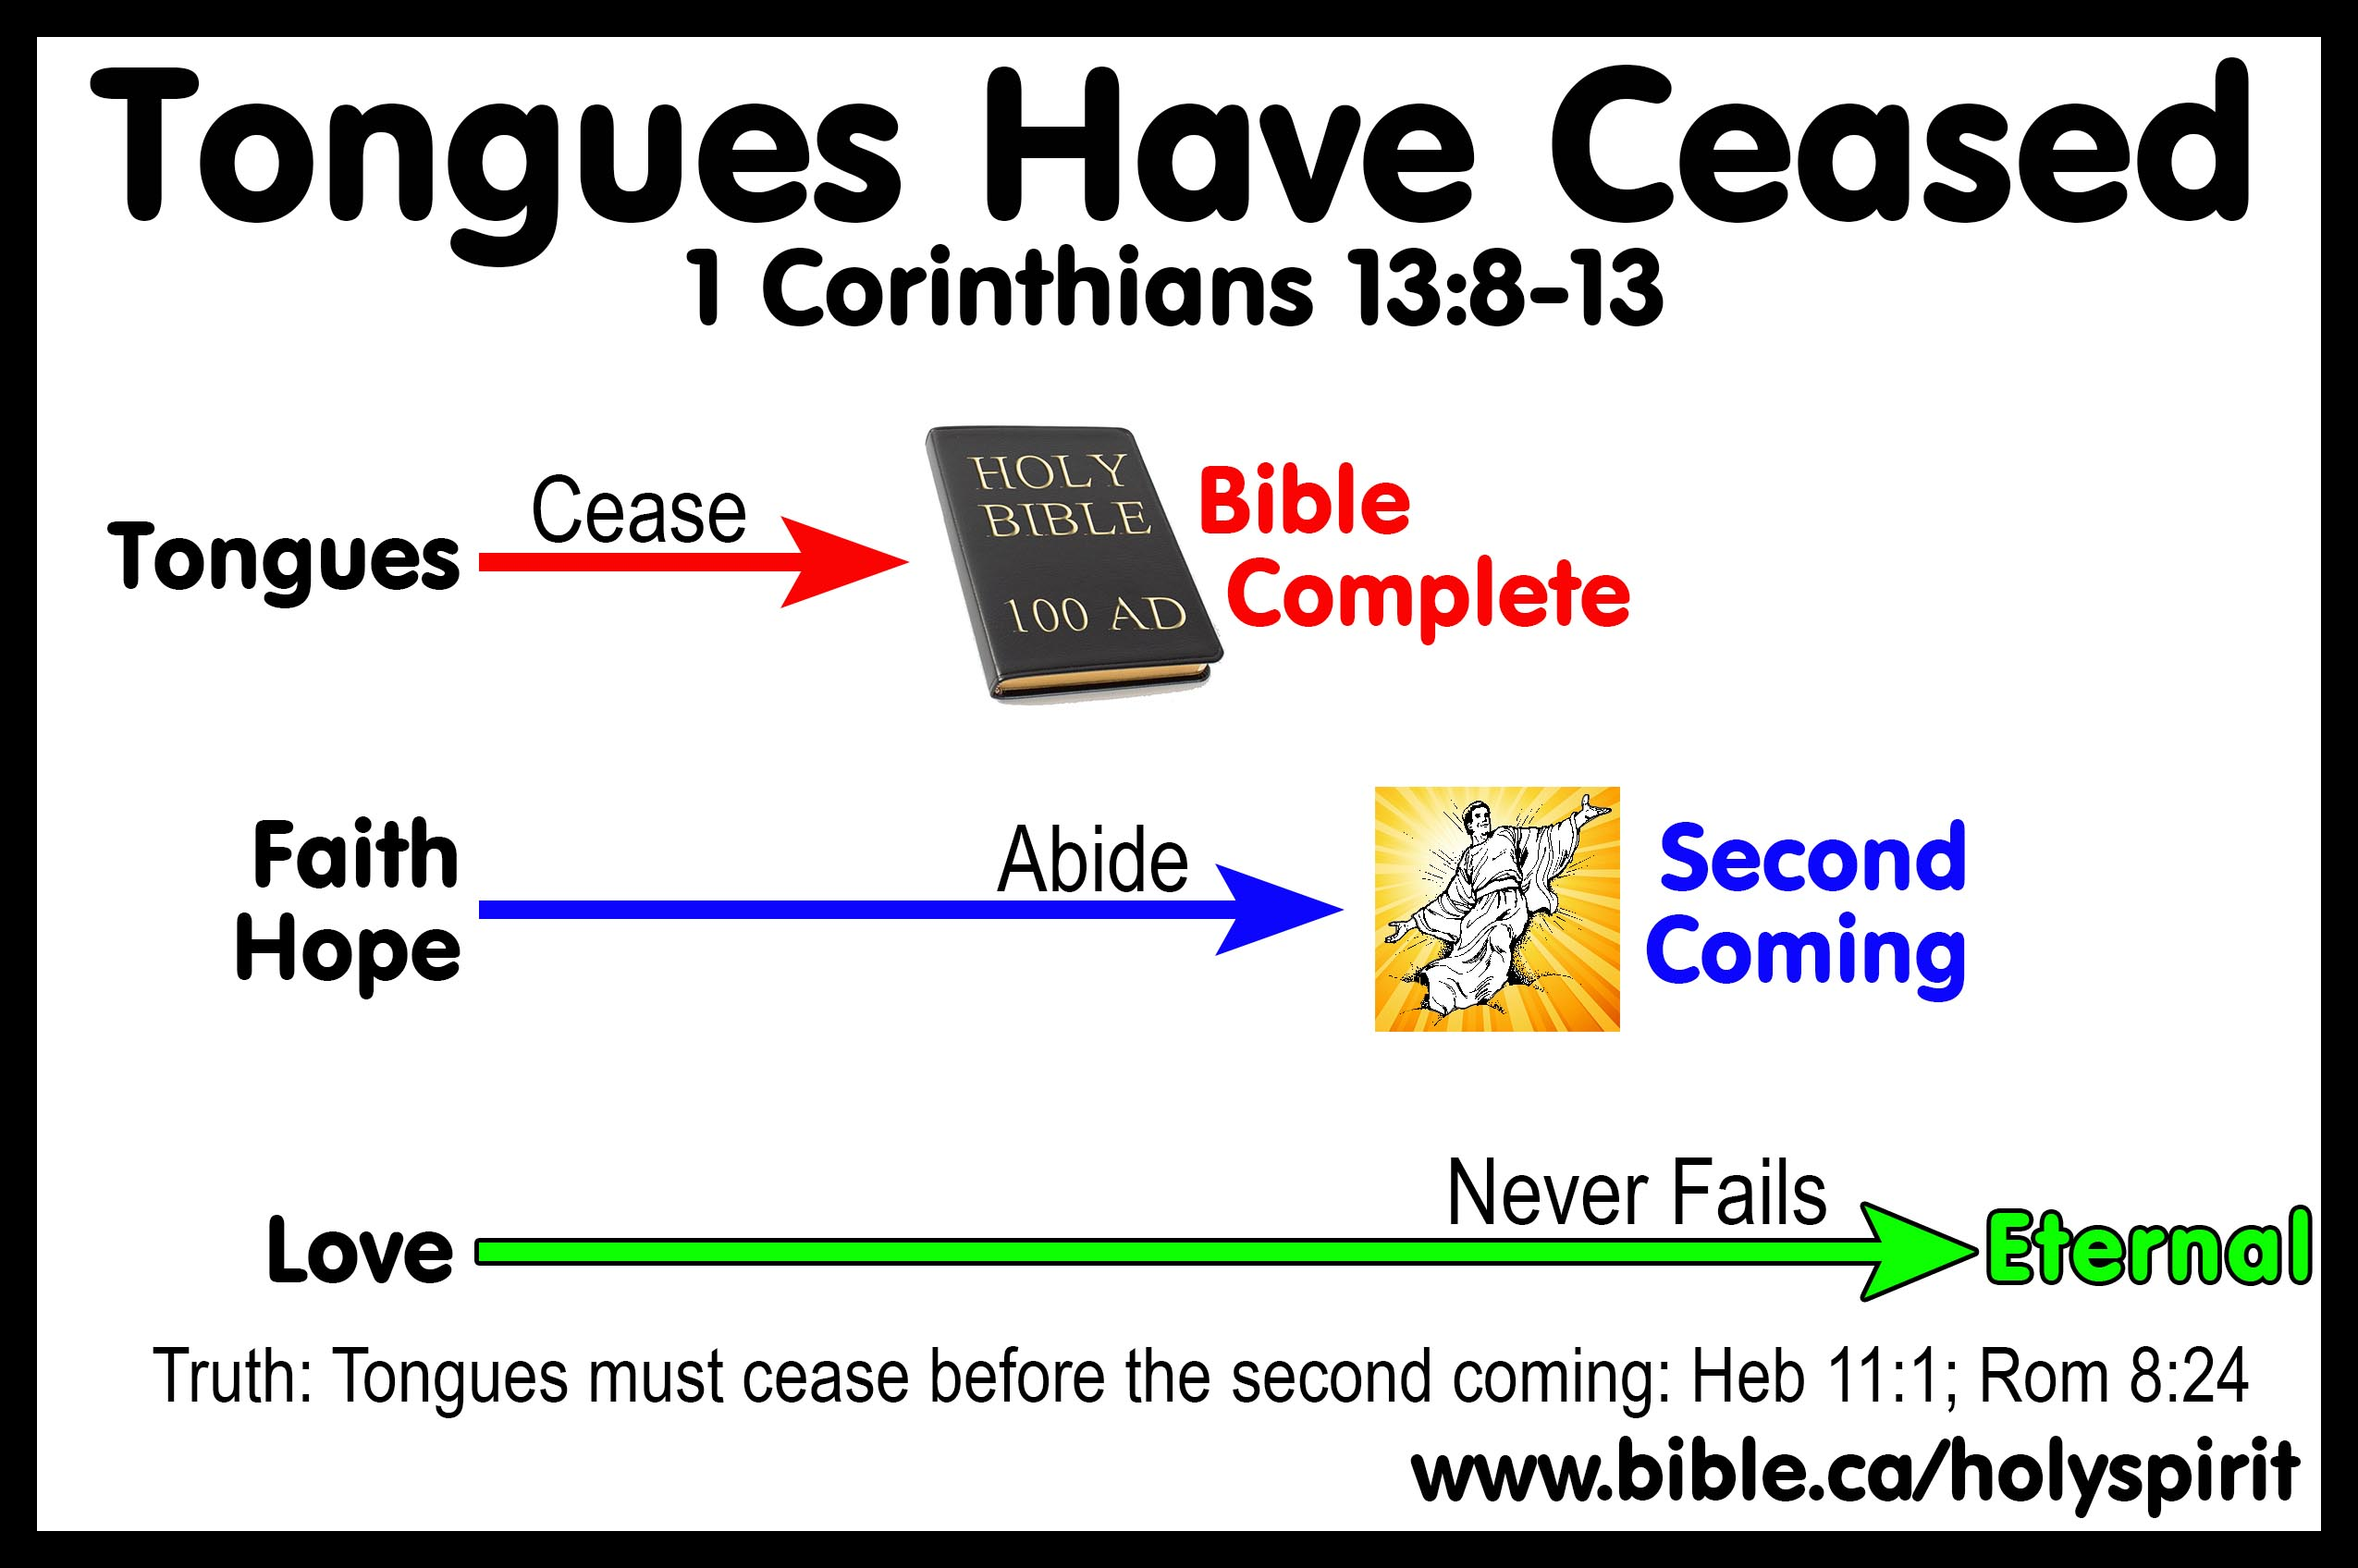 https://www.bible.ca/holyspirit/Holy-Spirit-tongues-ceased-faith-hope-abide-love-never-fails-1-corinthians-13-8-100AD-today-gibberish-music.jpg